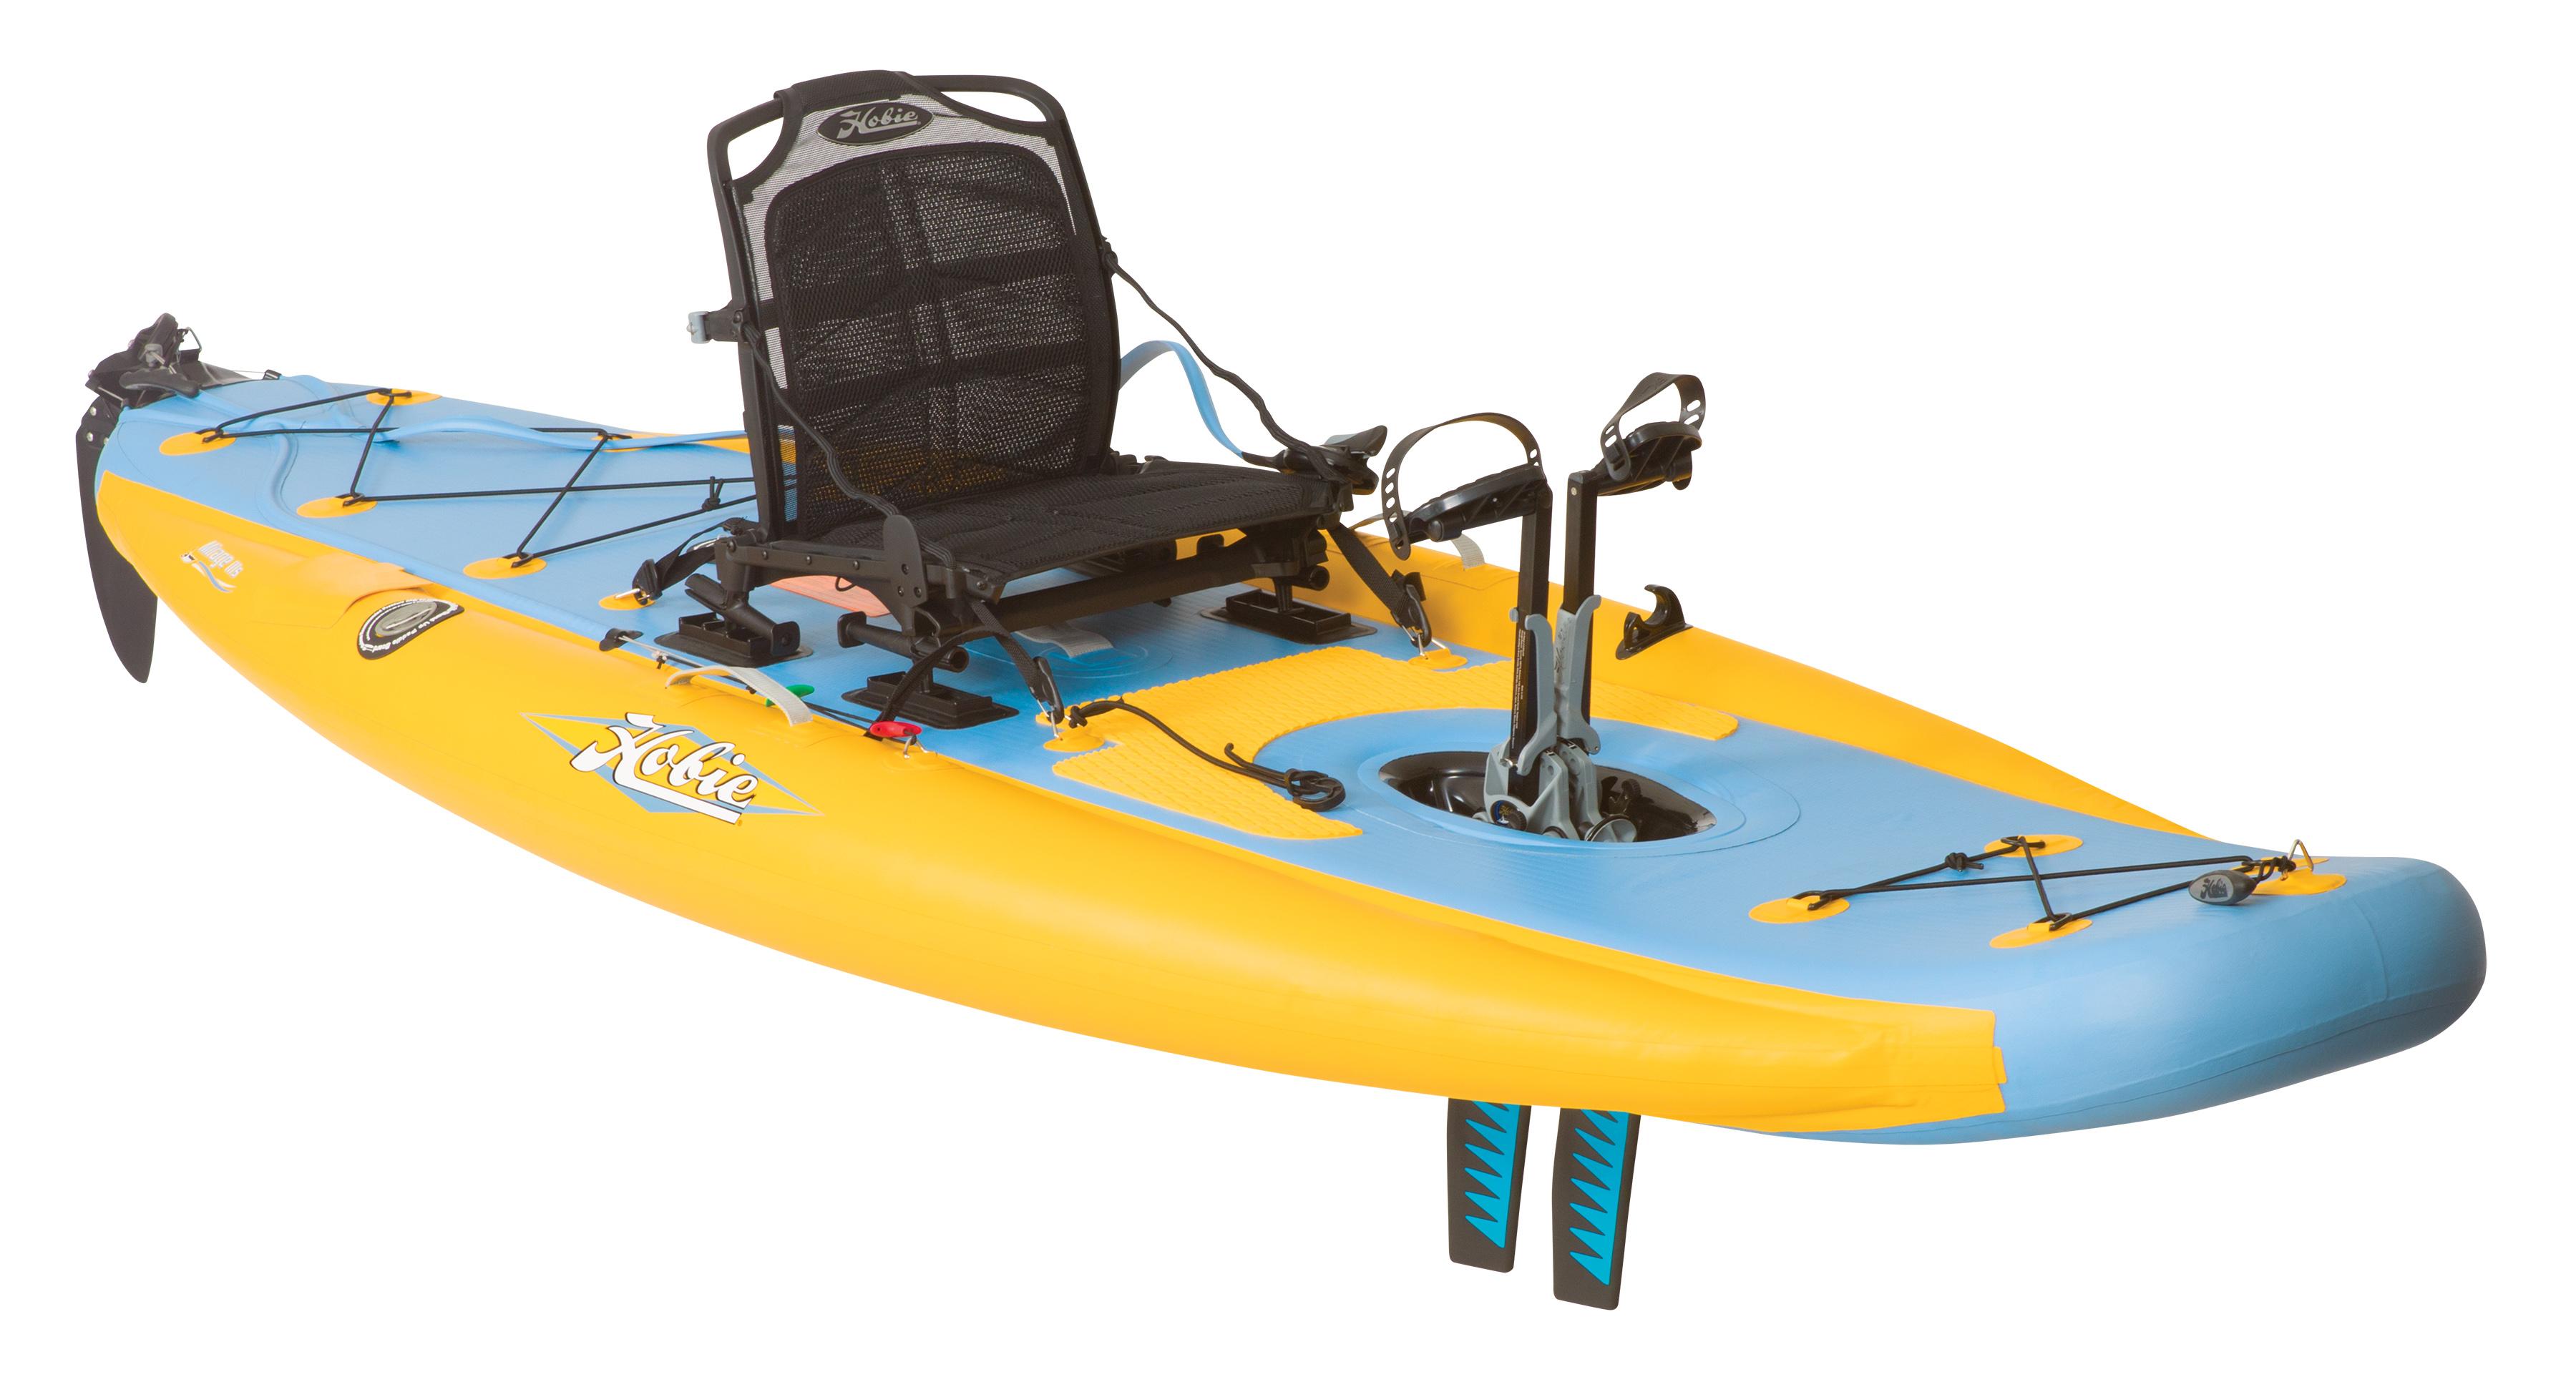 Hobie Inflatable Kayak Review